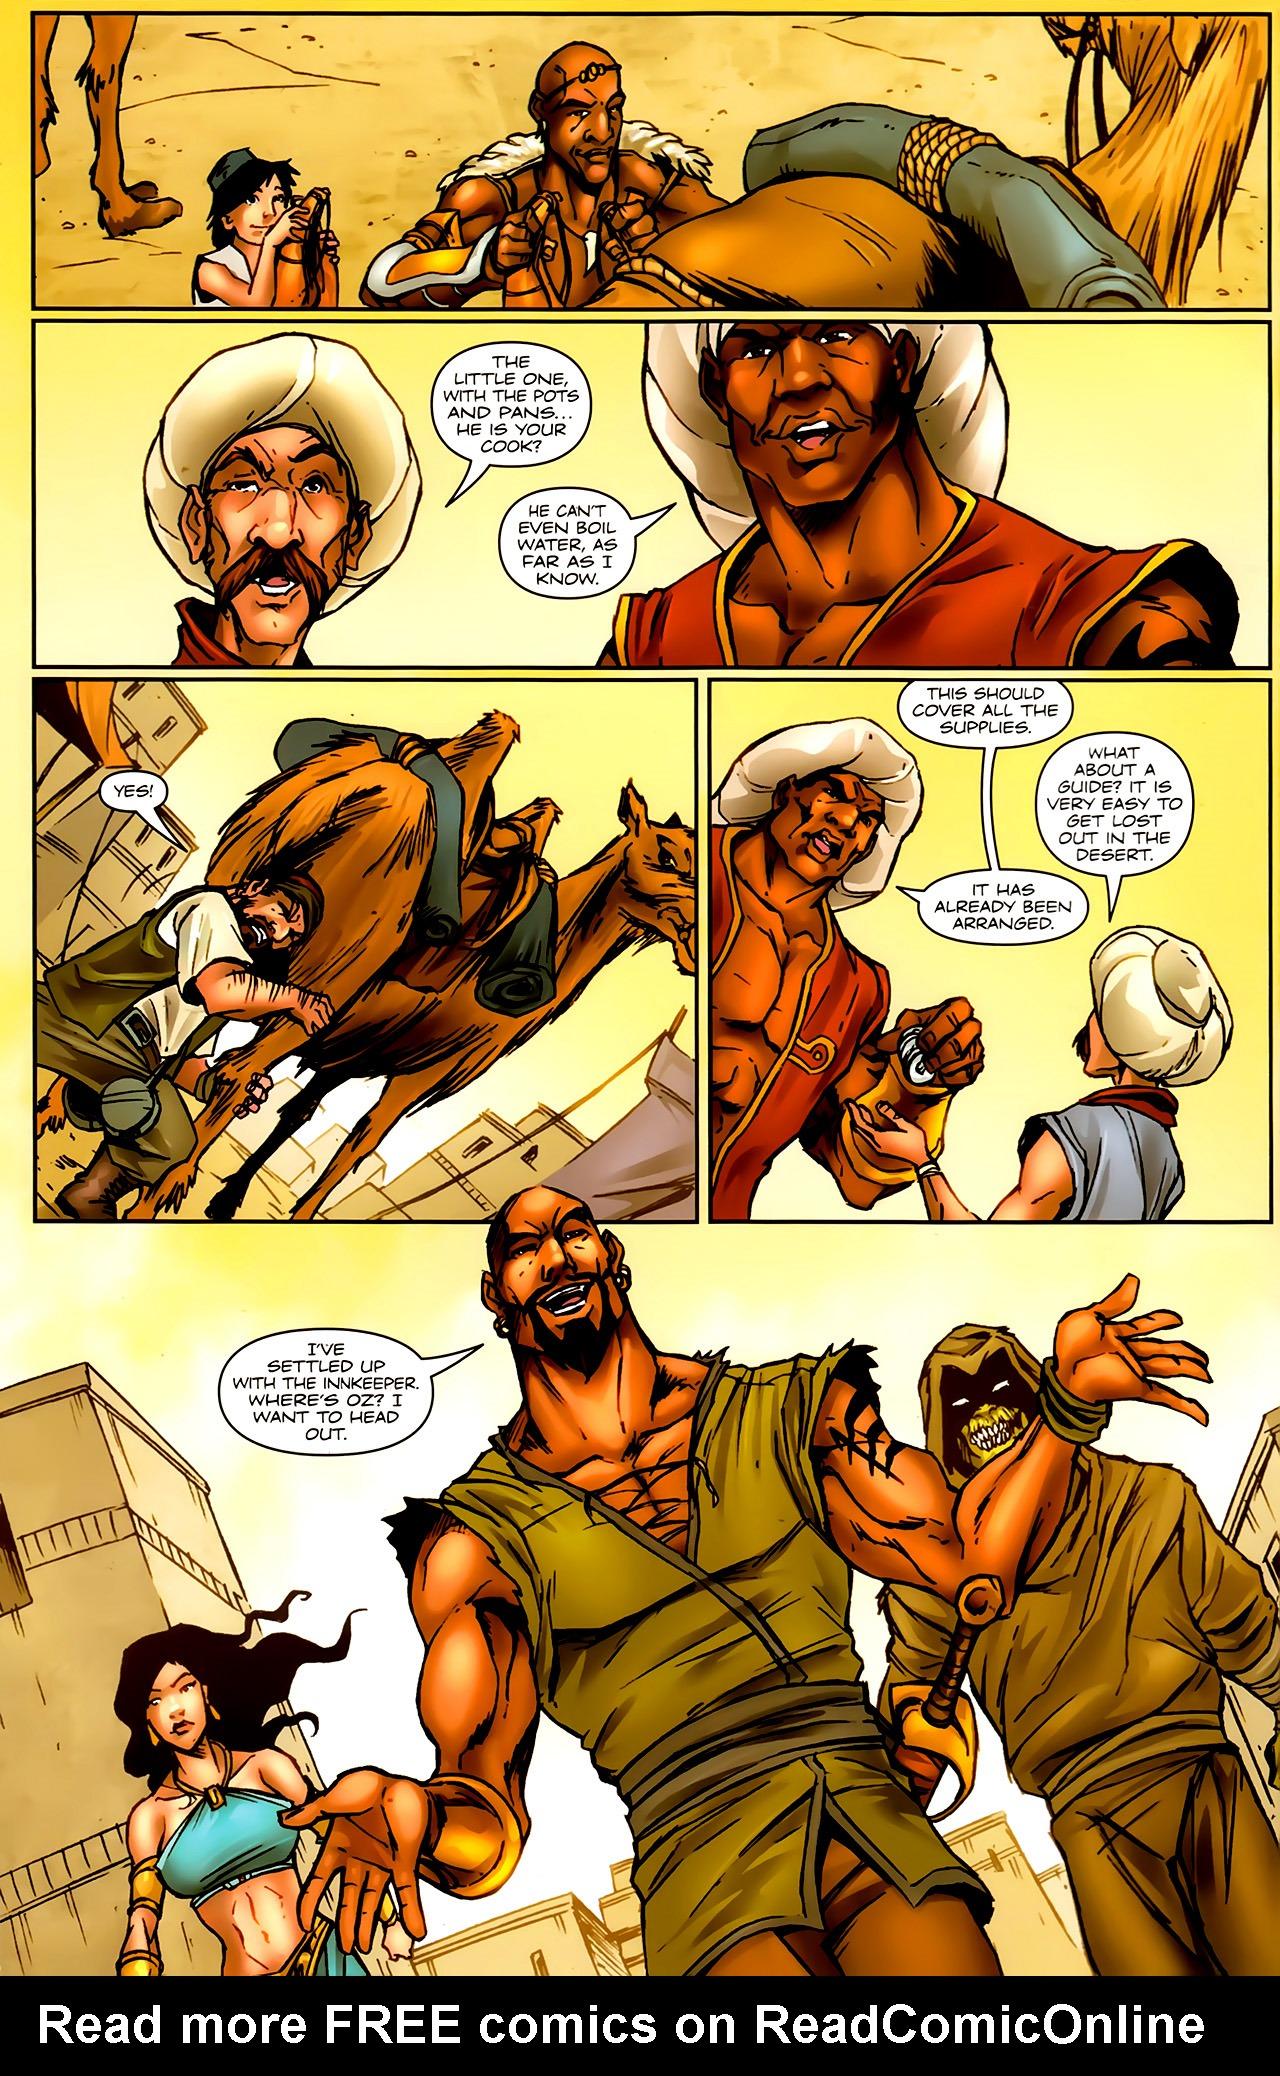 Read online 1001 Arabian Nights: The Adventures of Sinbad comic -  Issue #9 - 4